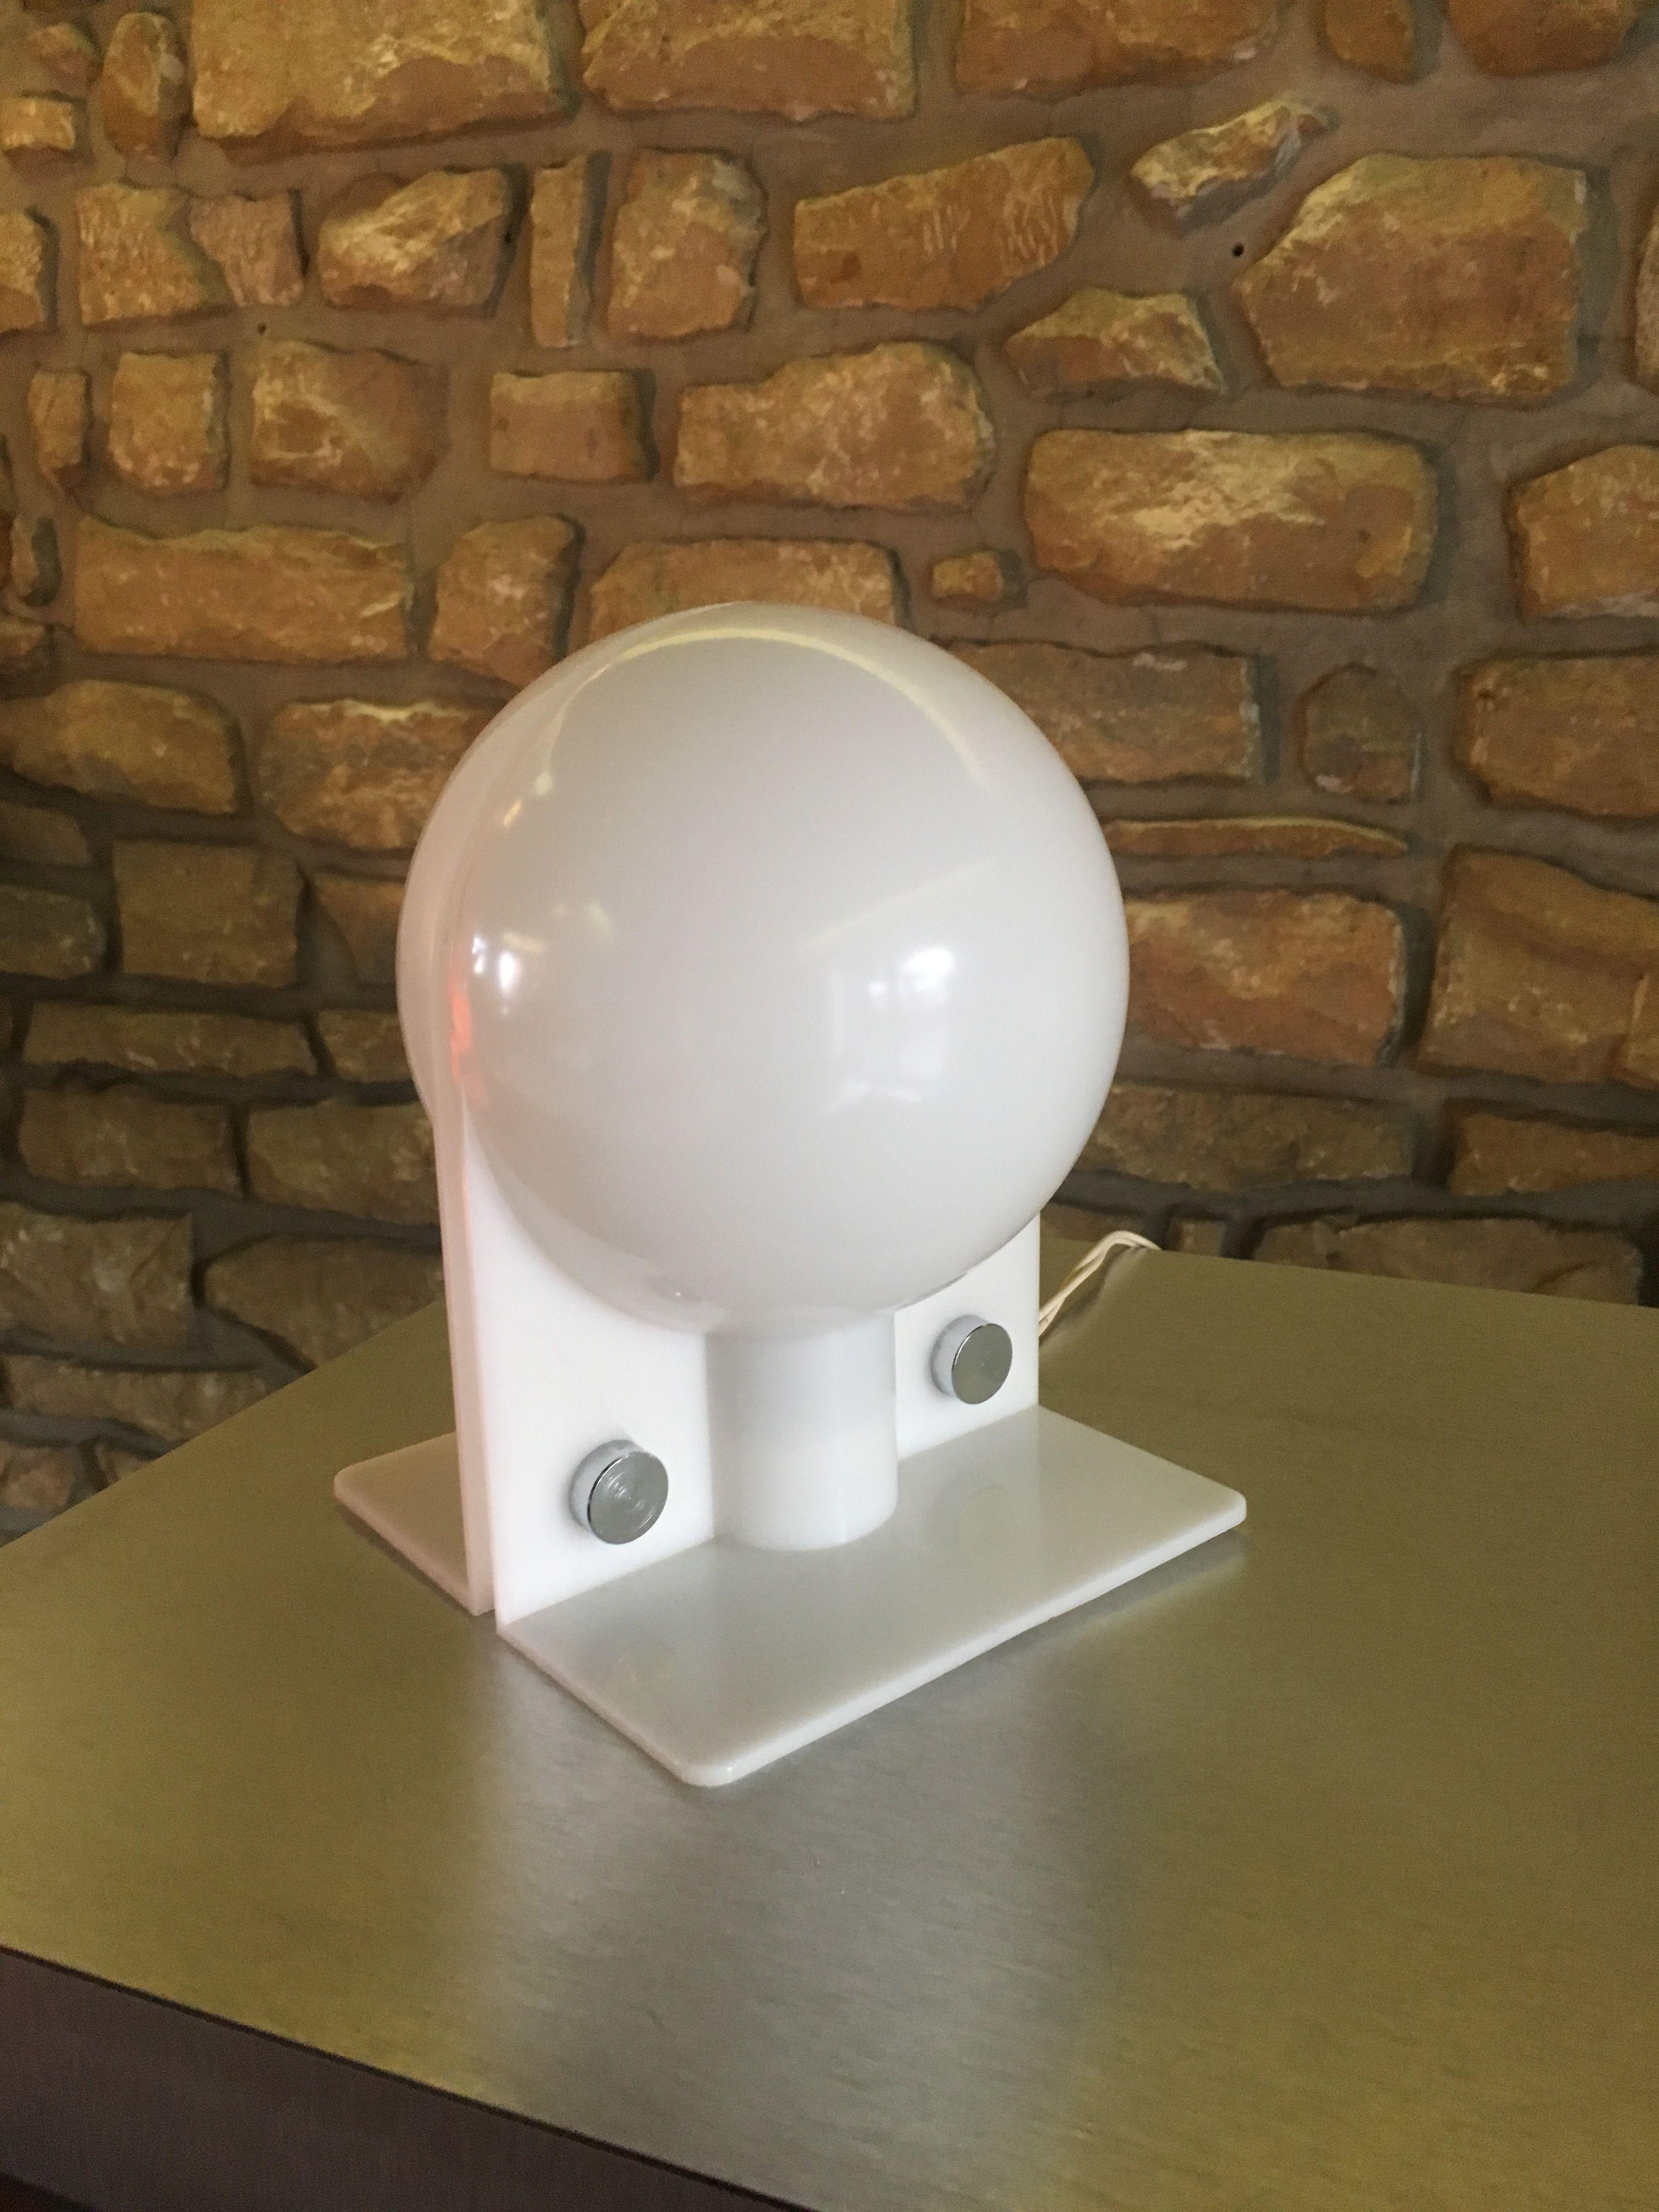 Lamp Sirio produces by Guzzini